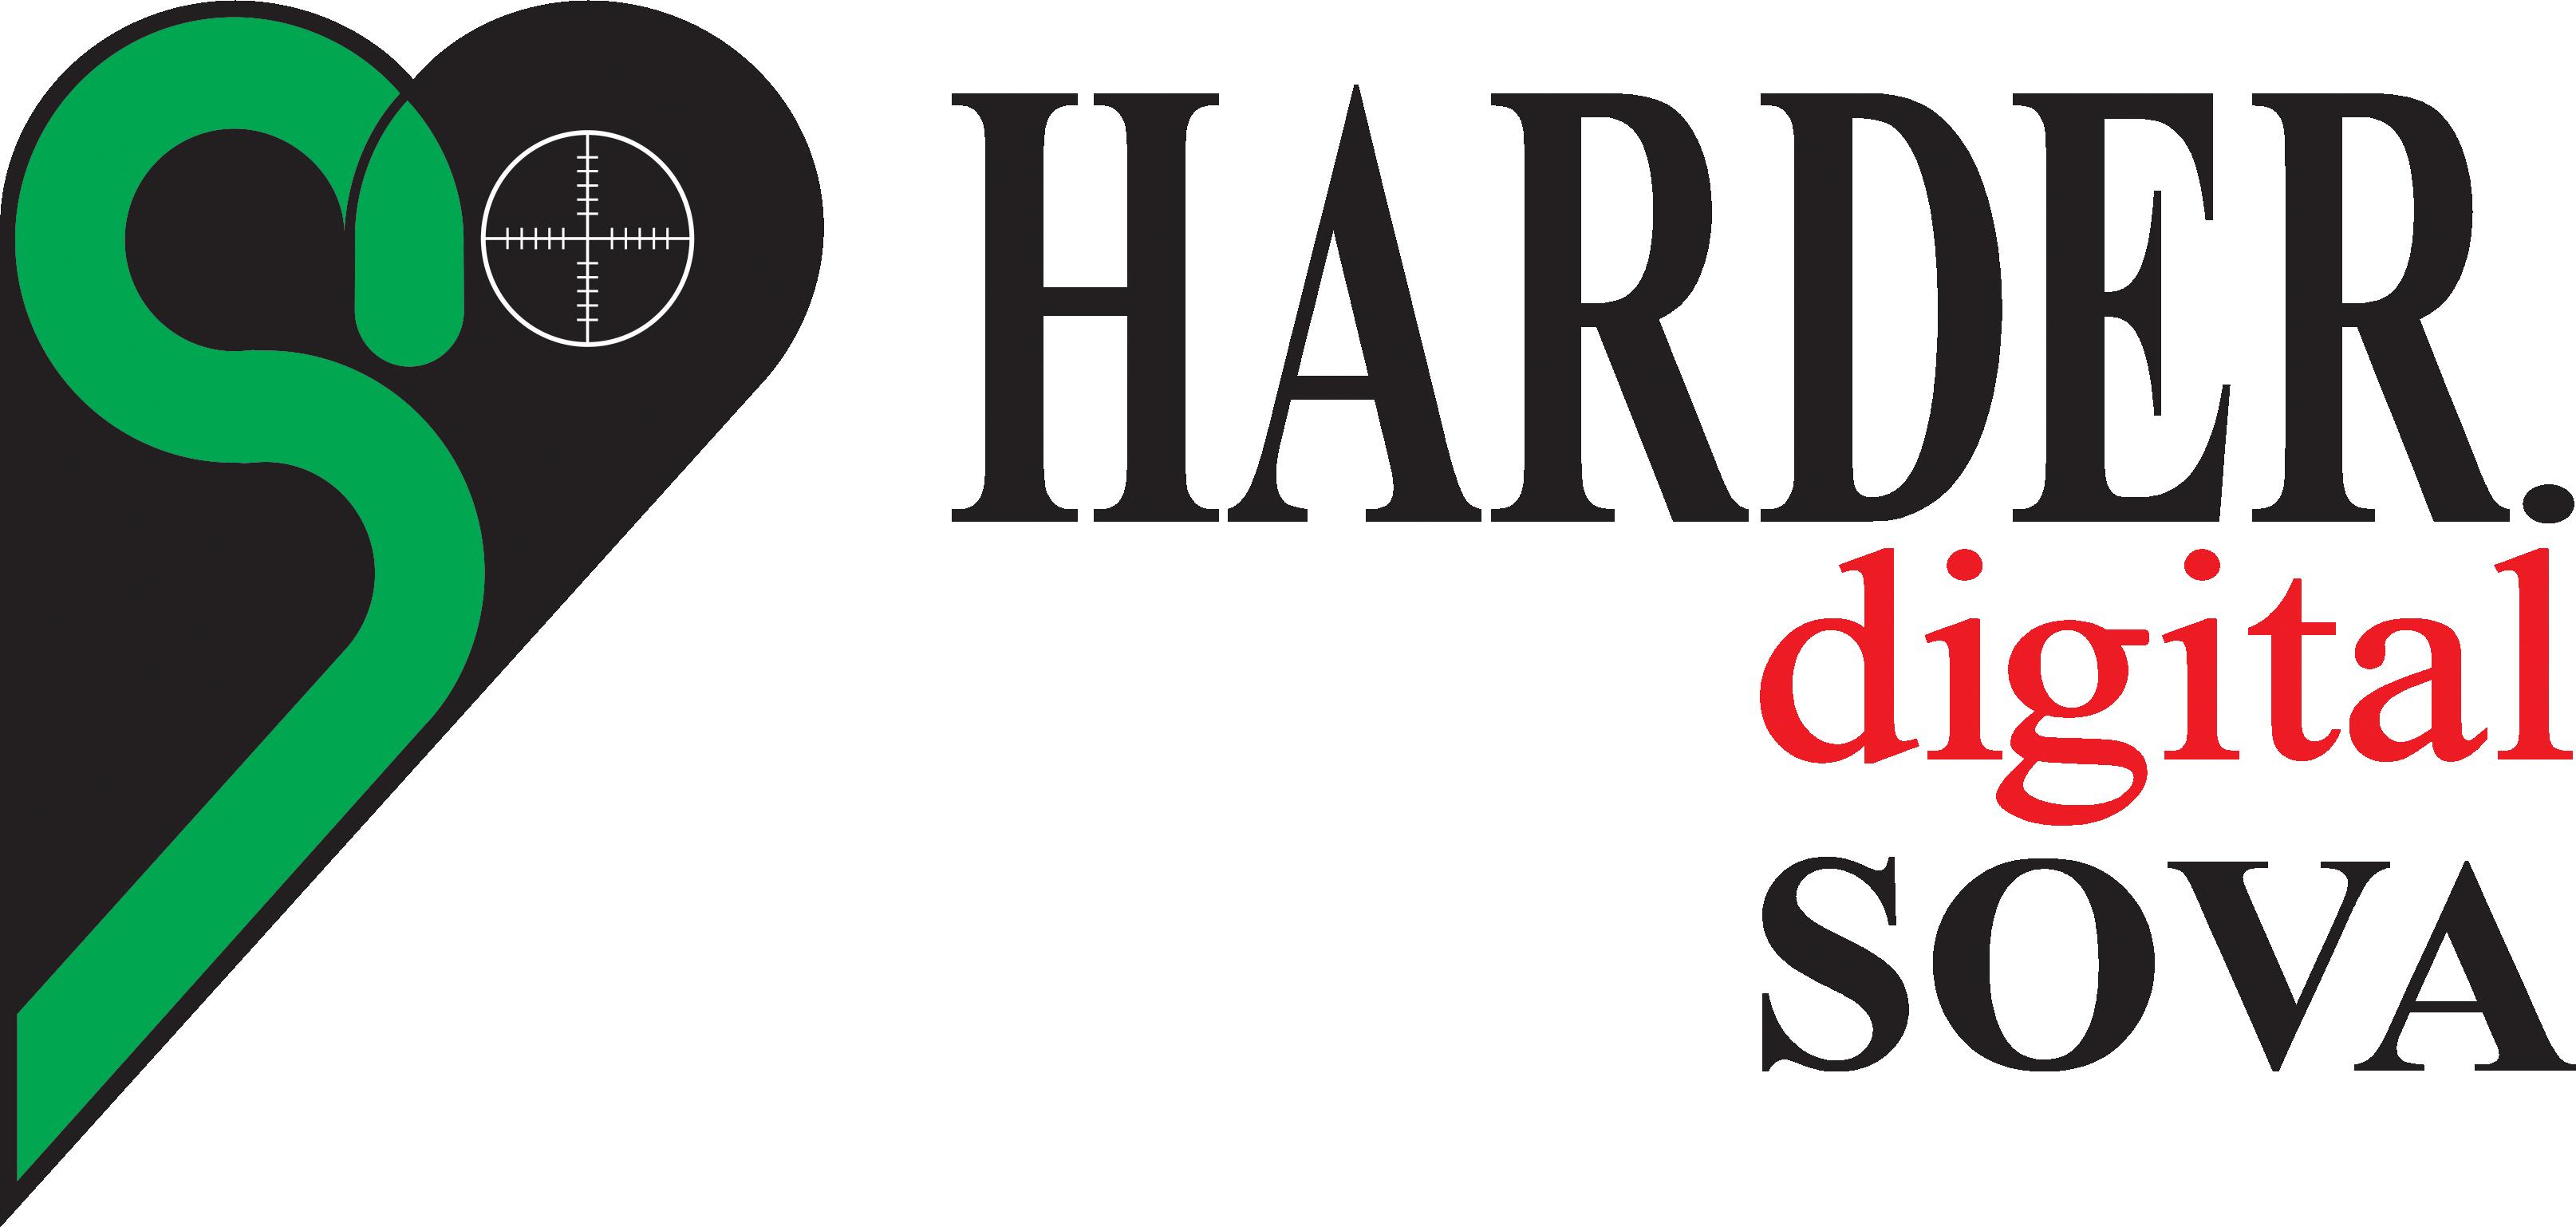 HARDER. digital SOVA d.o.o. Niš